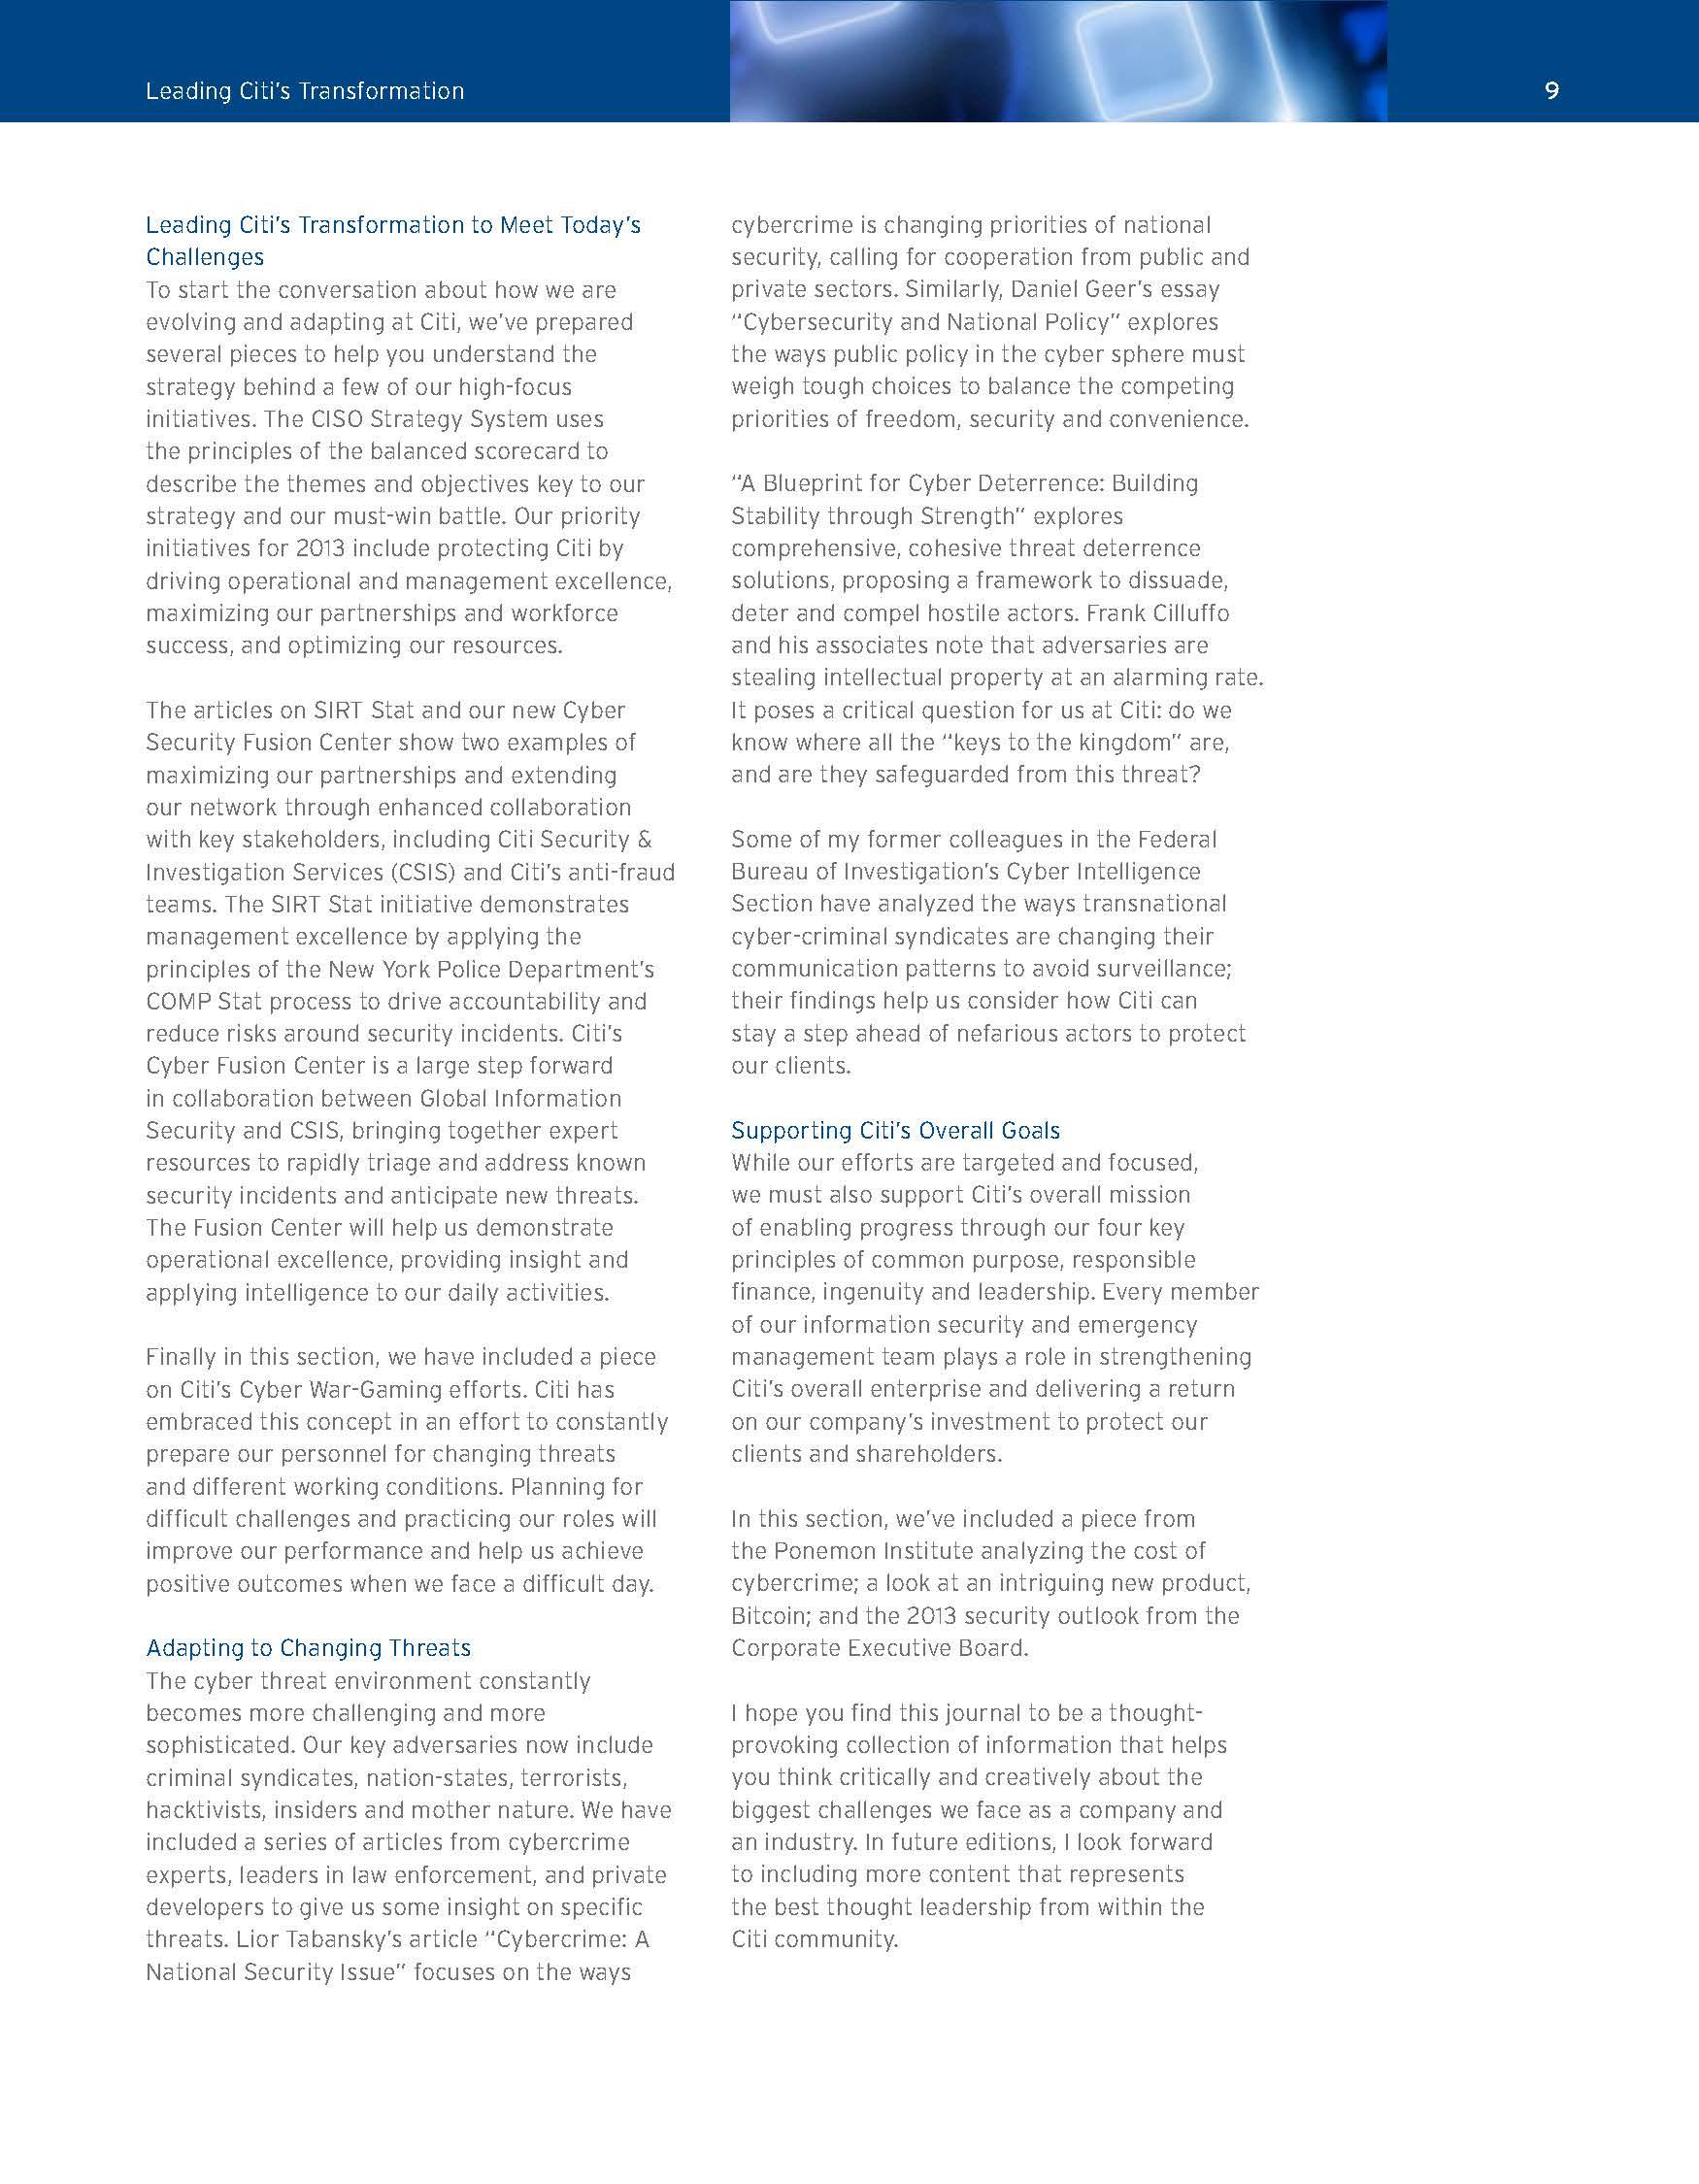 1094887_Citi_Cyber_Intelligence_Journal_FINALPRINT_9.30._sm_Page_011.jpg